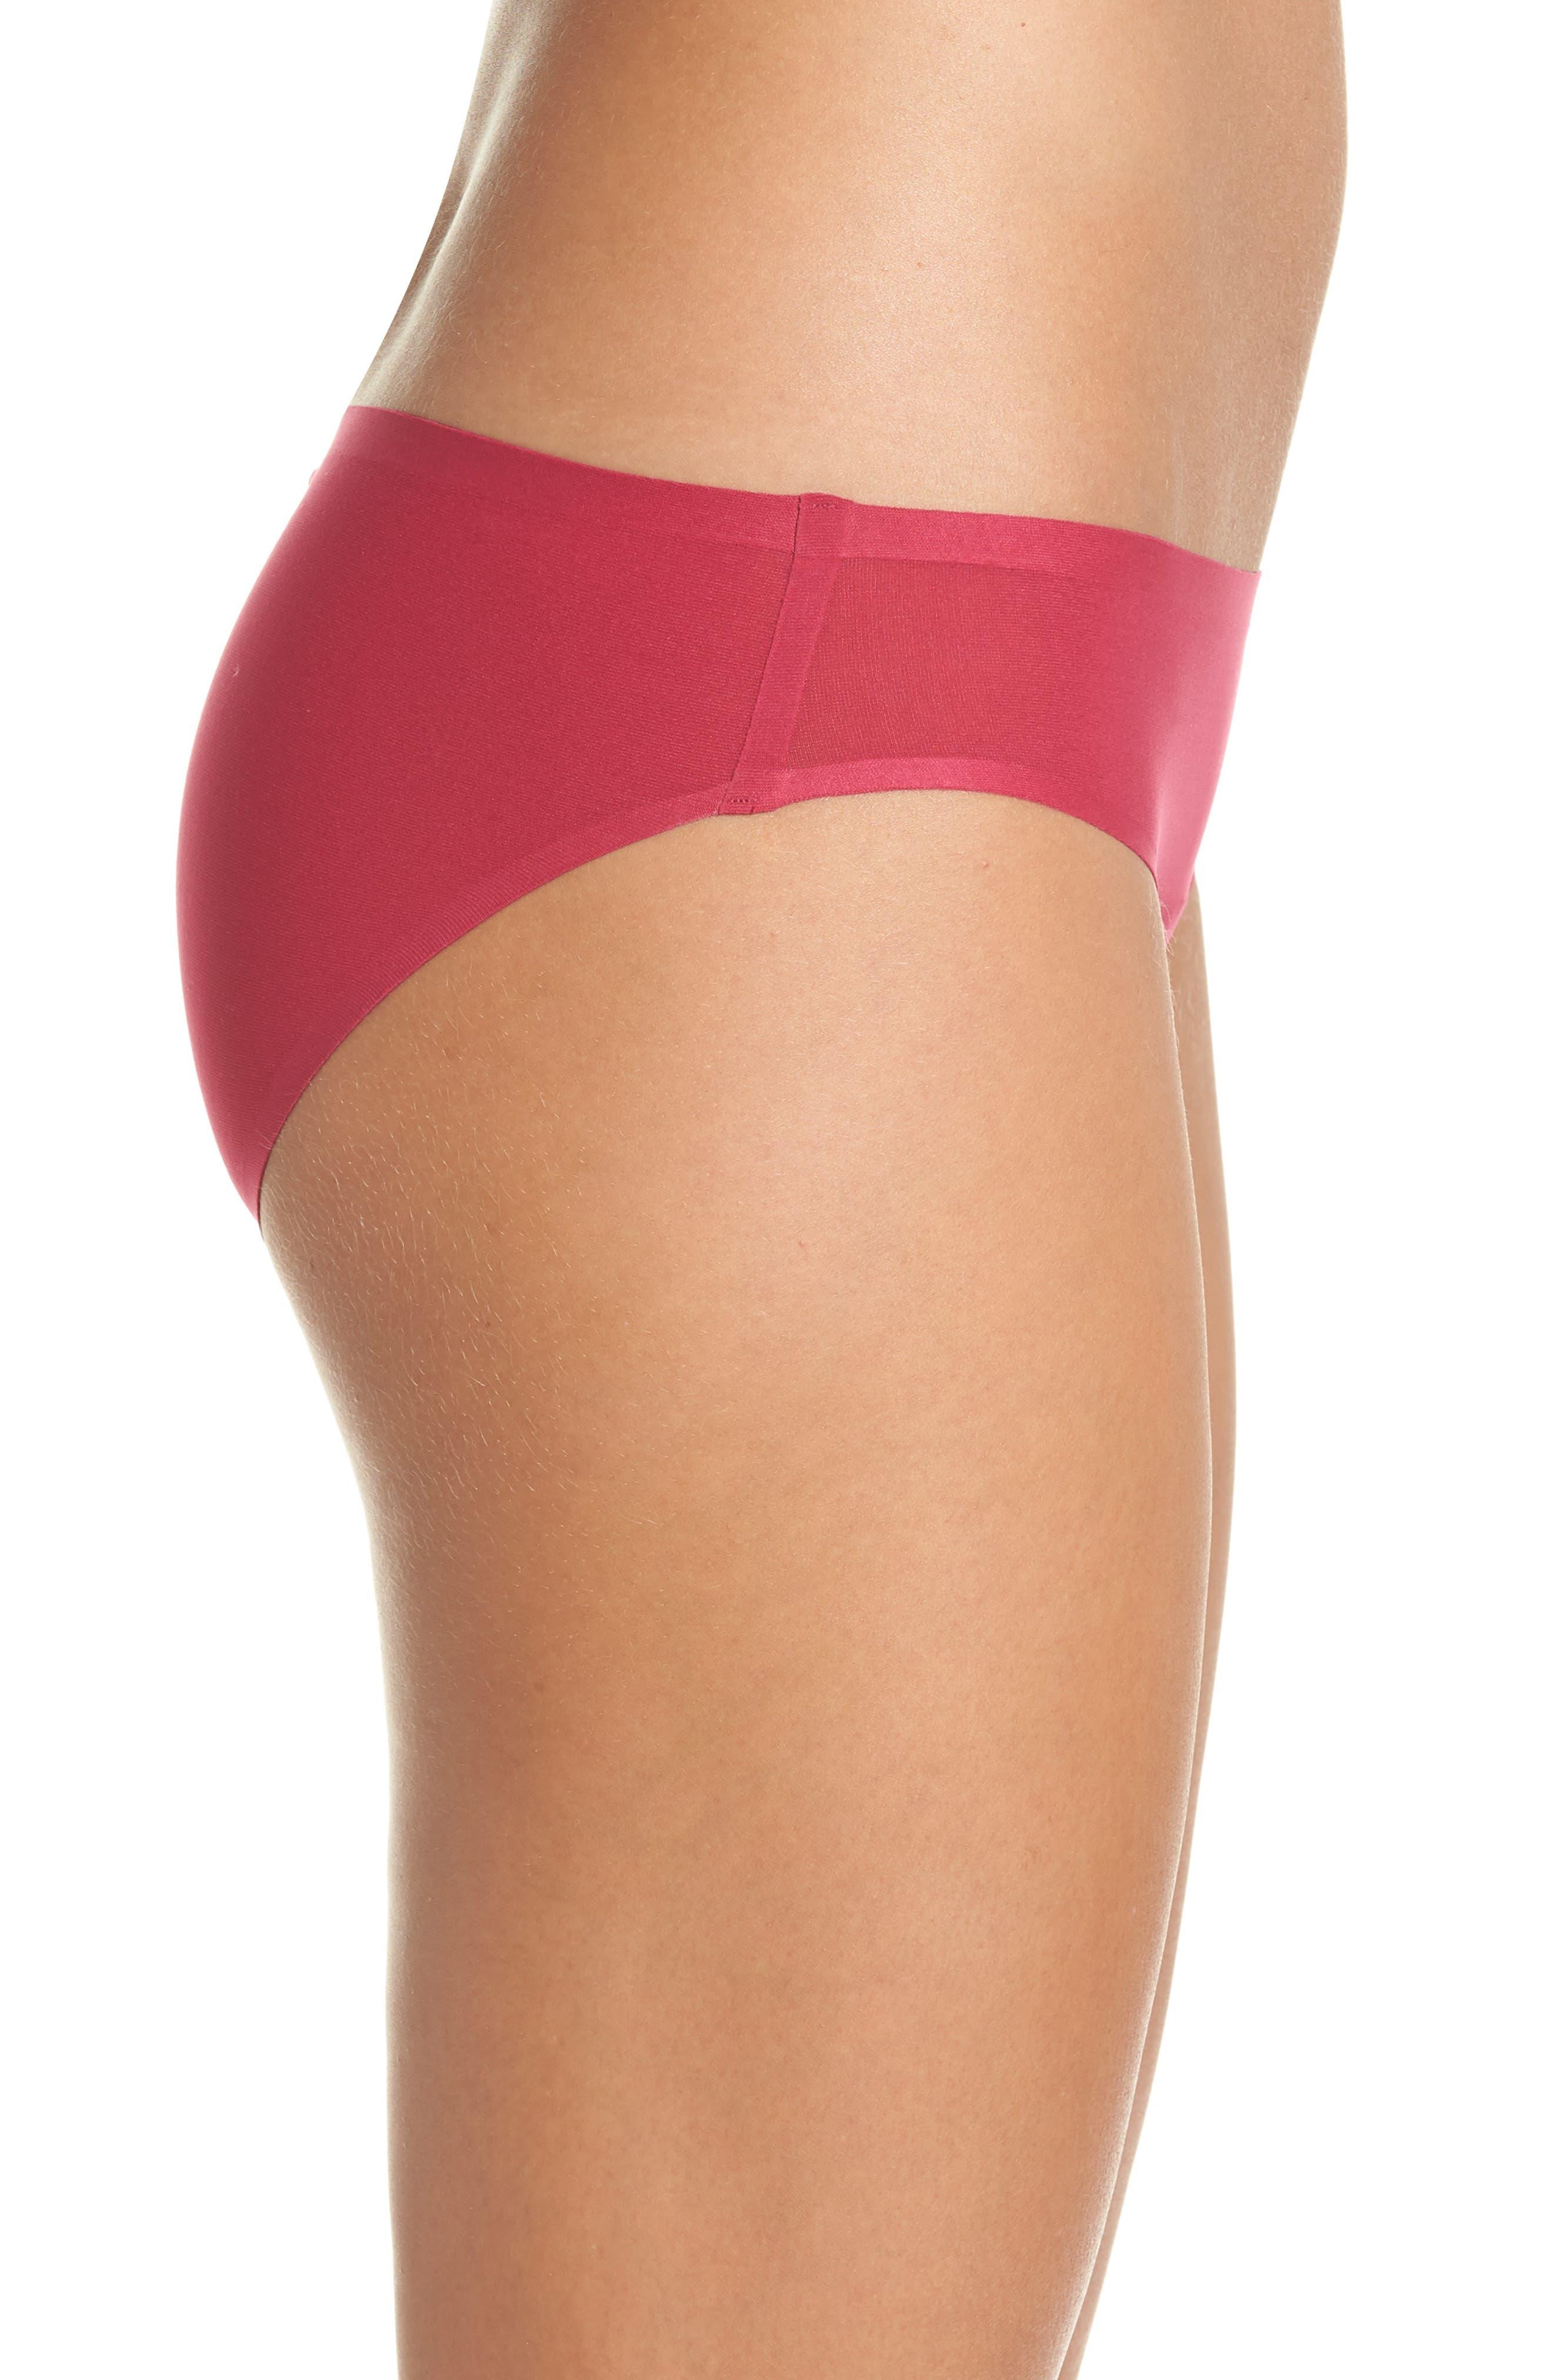 Soft Stretch Seamless Bikini,                             Alternate thumbnail 3, color,                             MAGENTA